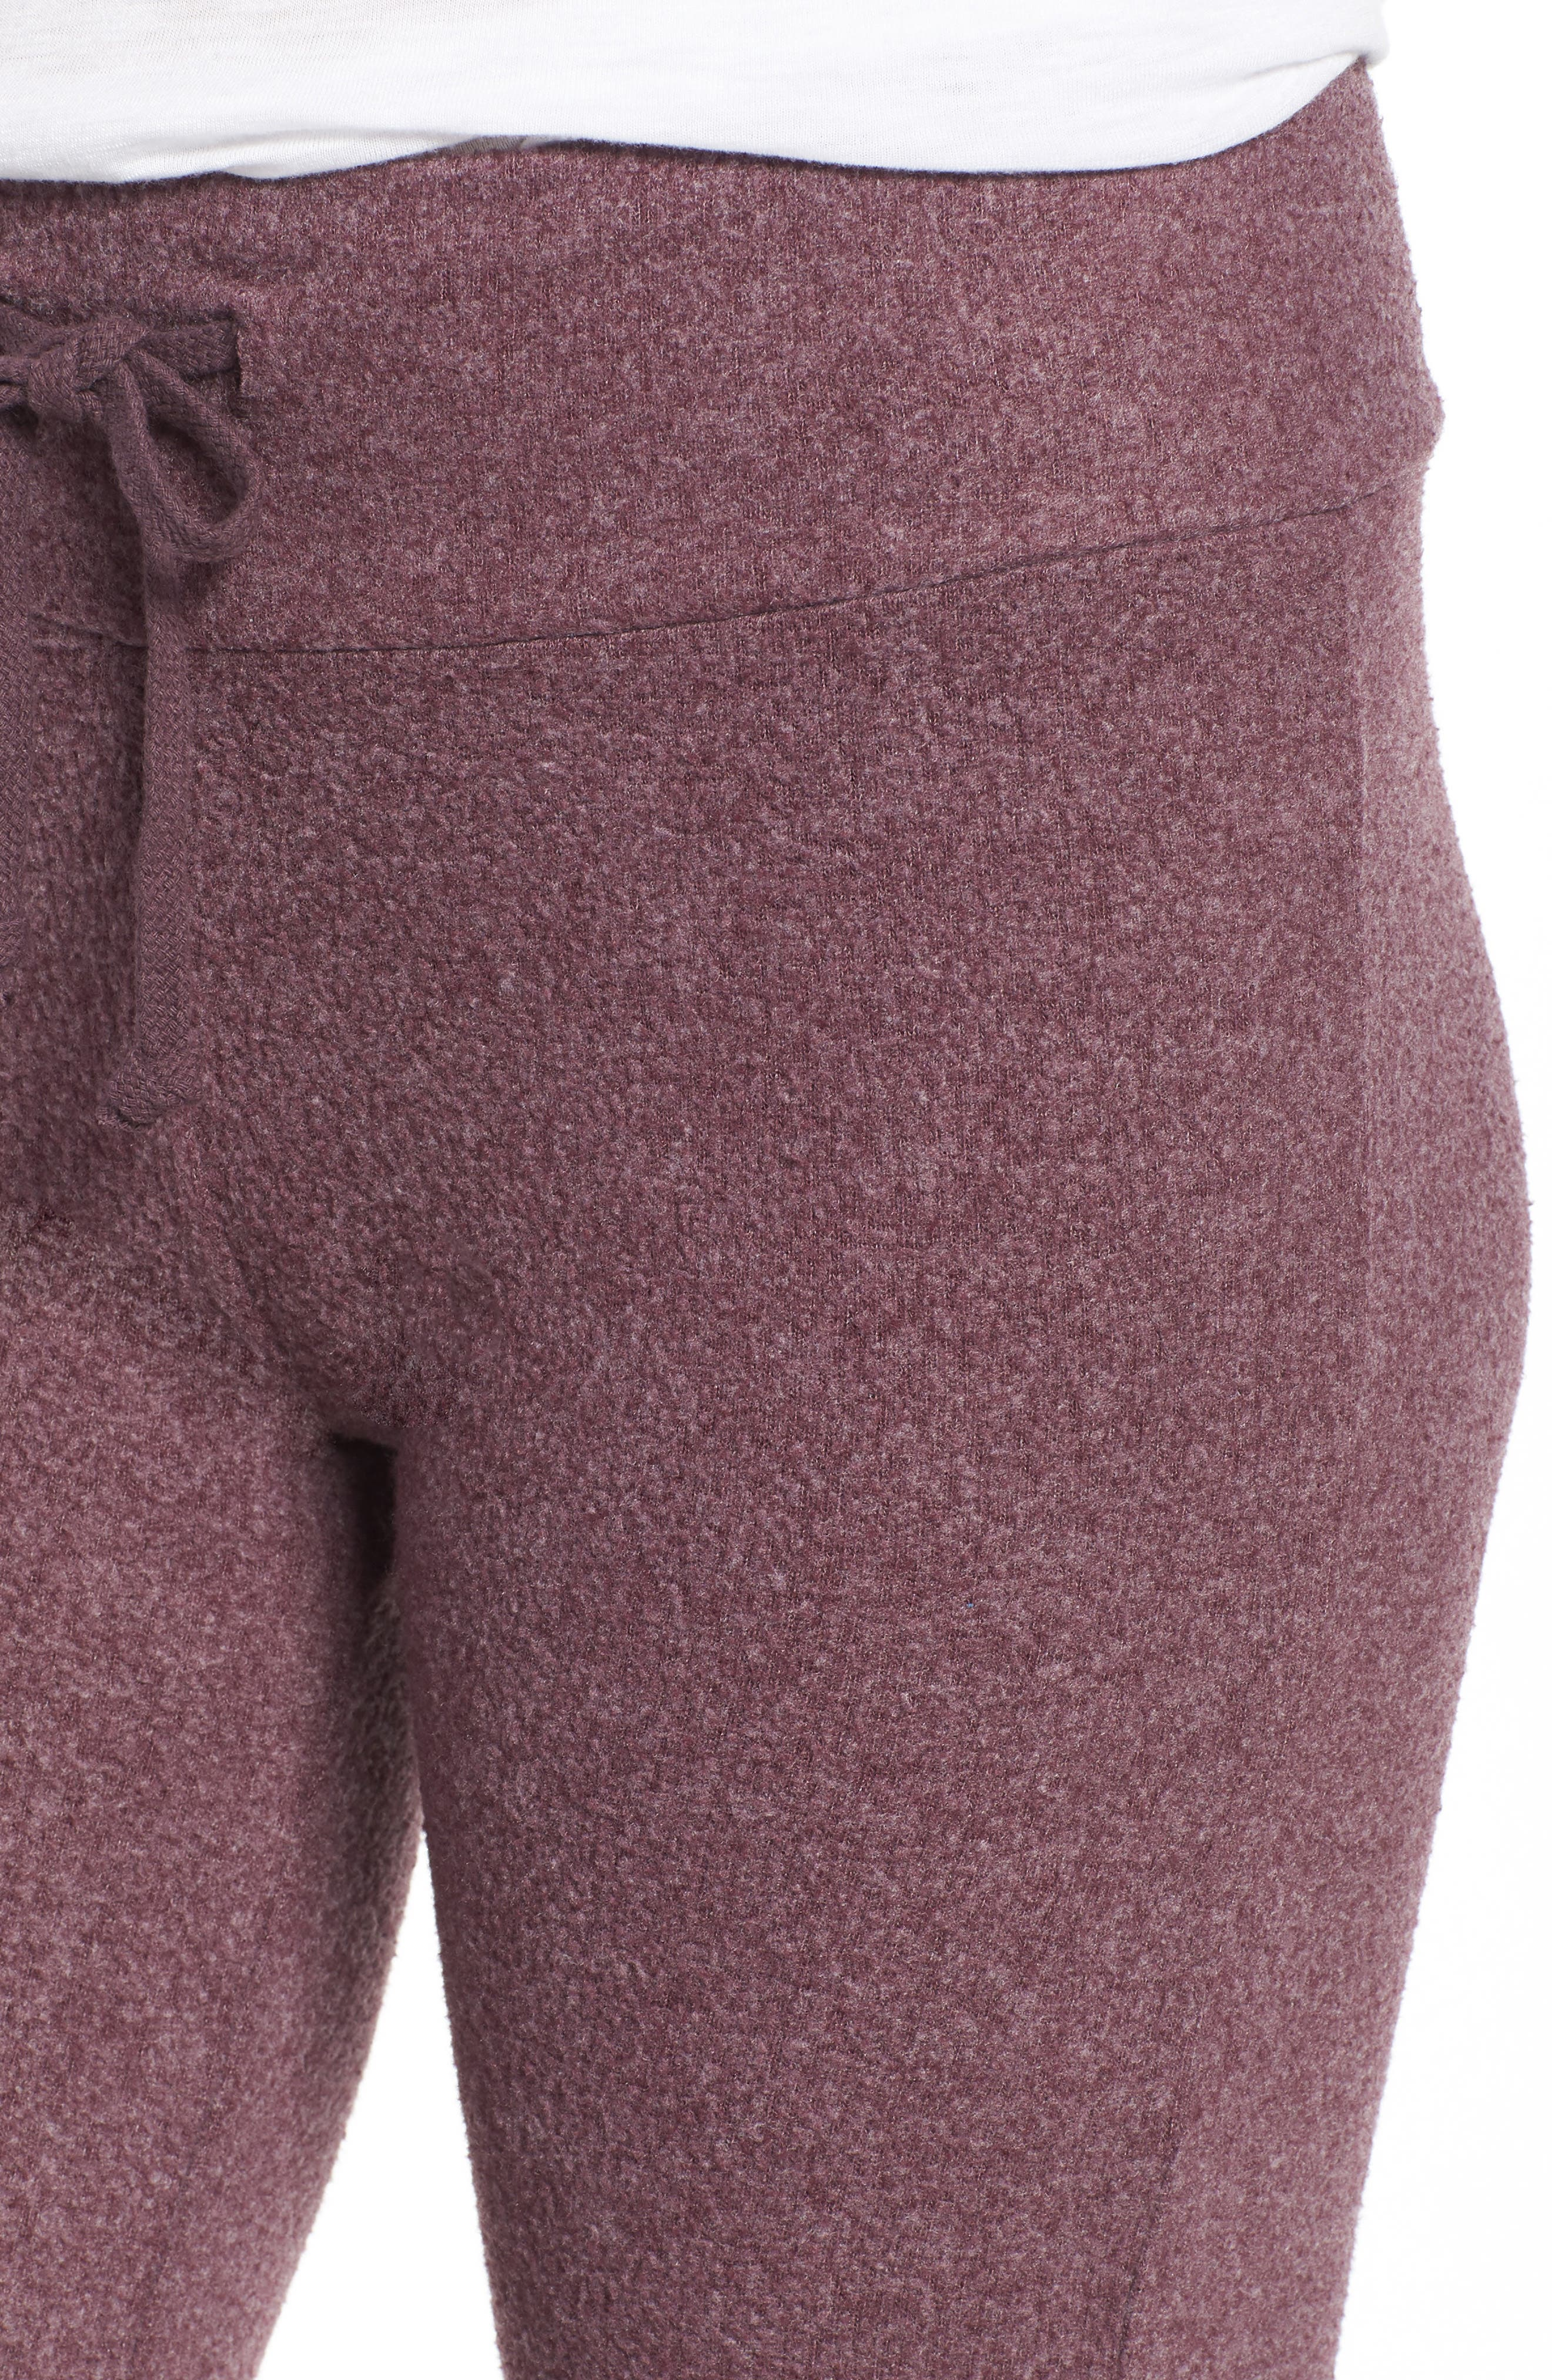 Tennis Club Fleece Pants,                             Alternate thumbnail 4, color,                             CRUSHED BERRY